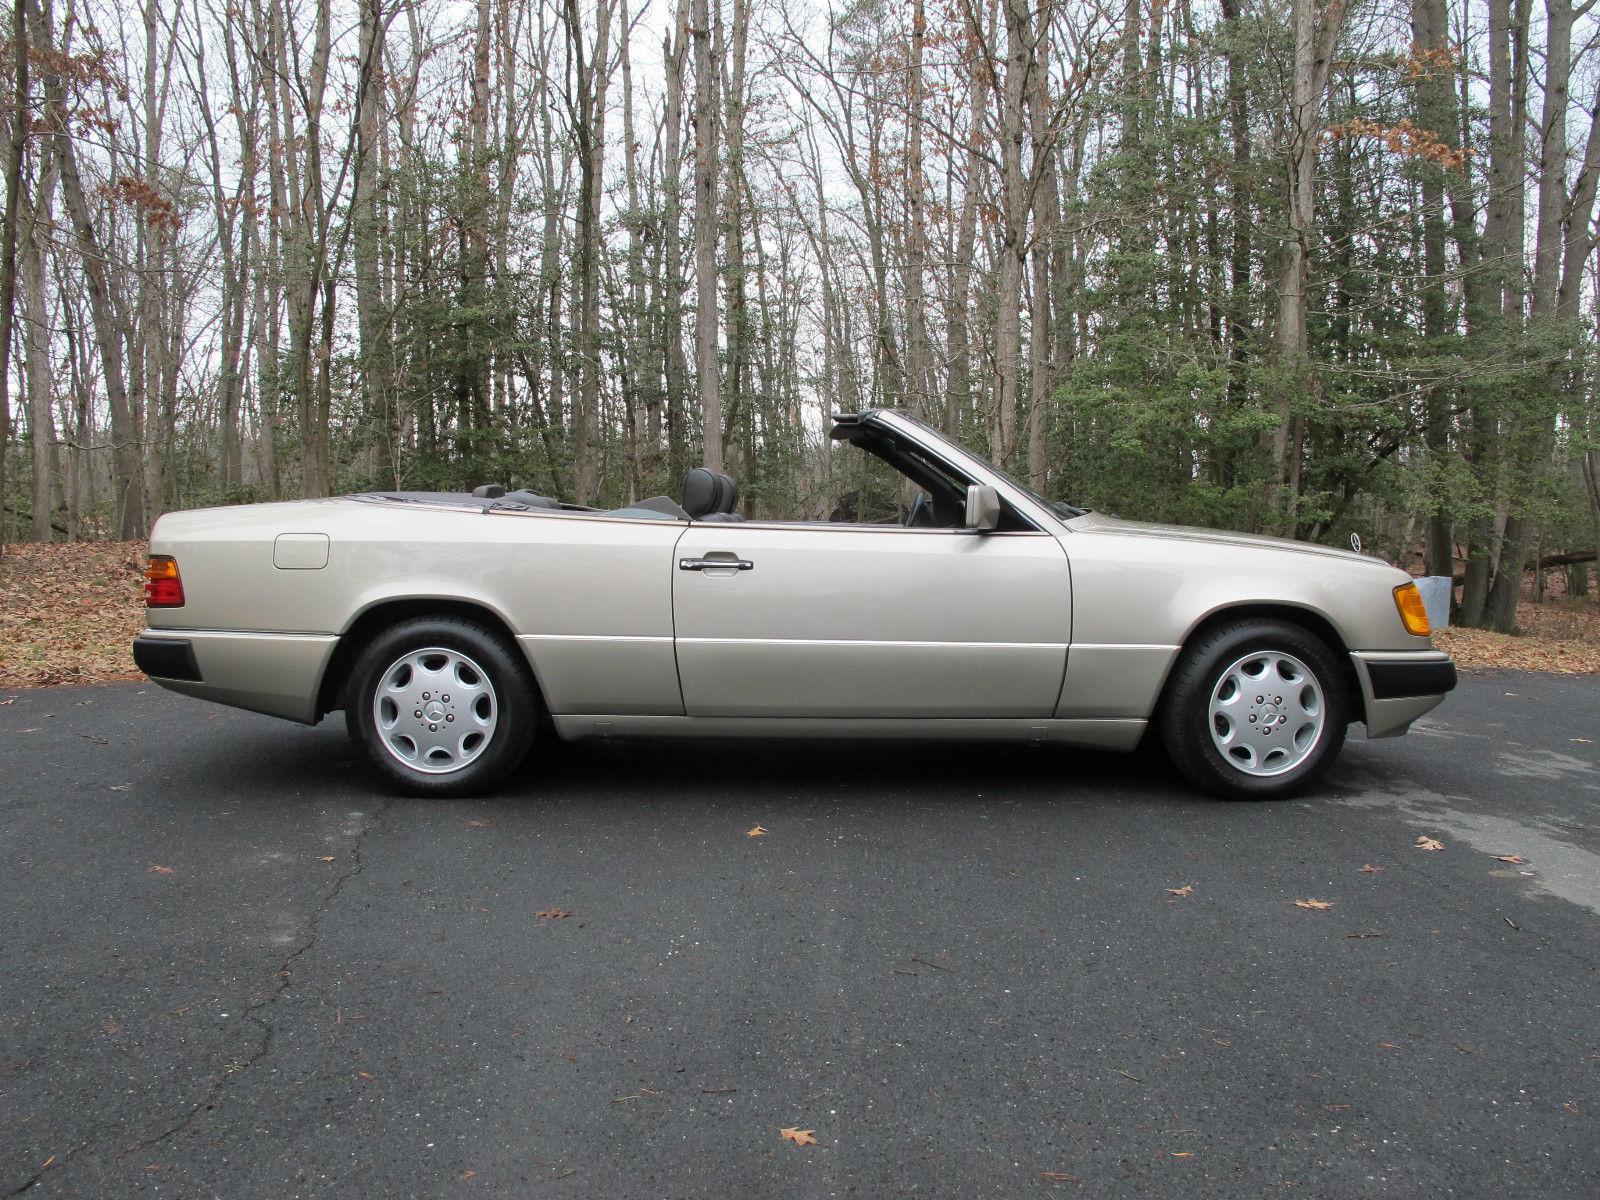 "A124 de ""A Firma"" está a venda no Ebay Tom-cruise-s-300-ce-cabriolet-from-the-firm-is-for-sale-photo-gallery_2"